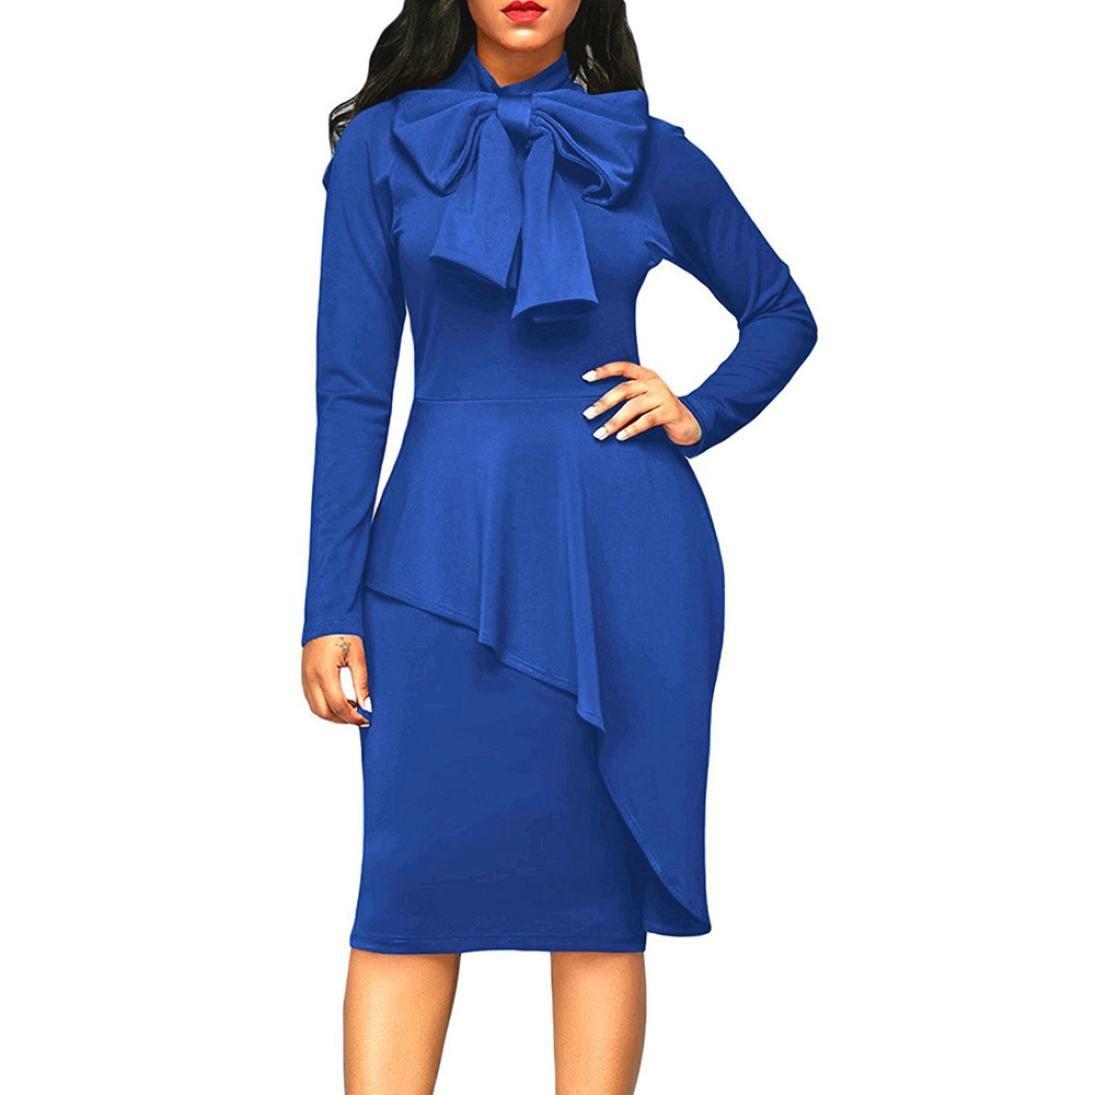 Funic Womens Tie Neck Peplum High Waist Long Sleeve Bodycon Dress Spring Knee-Length Dresses (L, Dark Blue)